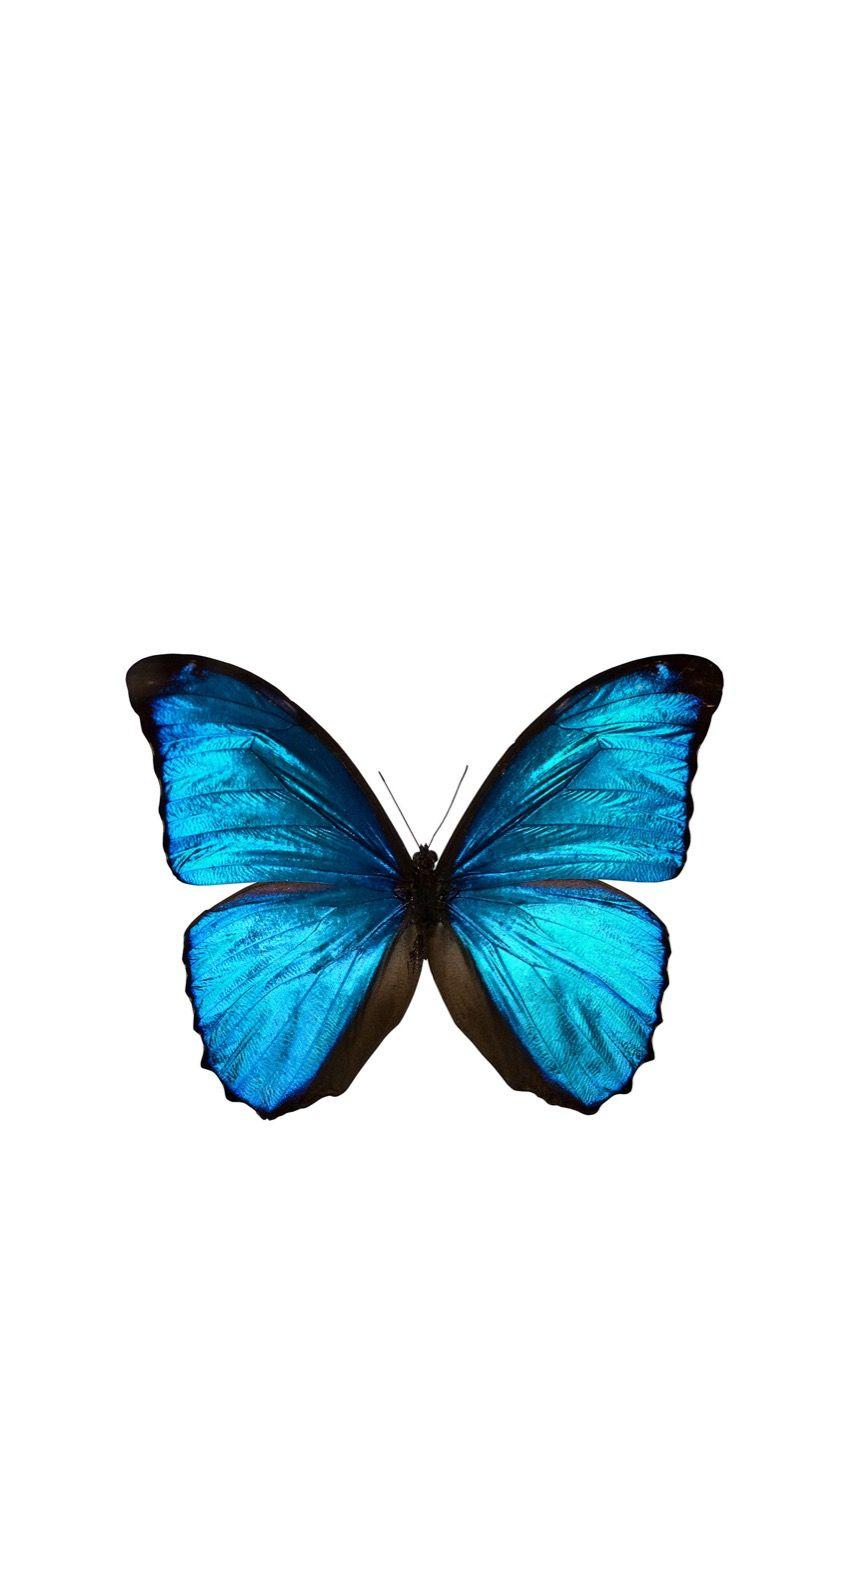 Pin Dianaherselff Fond D Ecran Colore Fond D Ecran Papillon Fond D Ecran De Telephone Disney